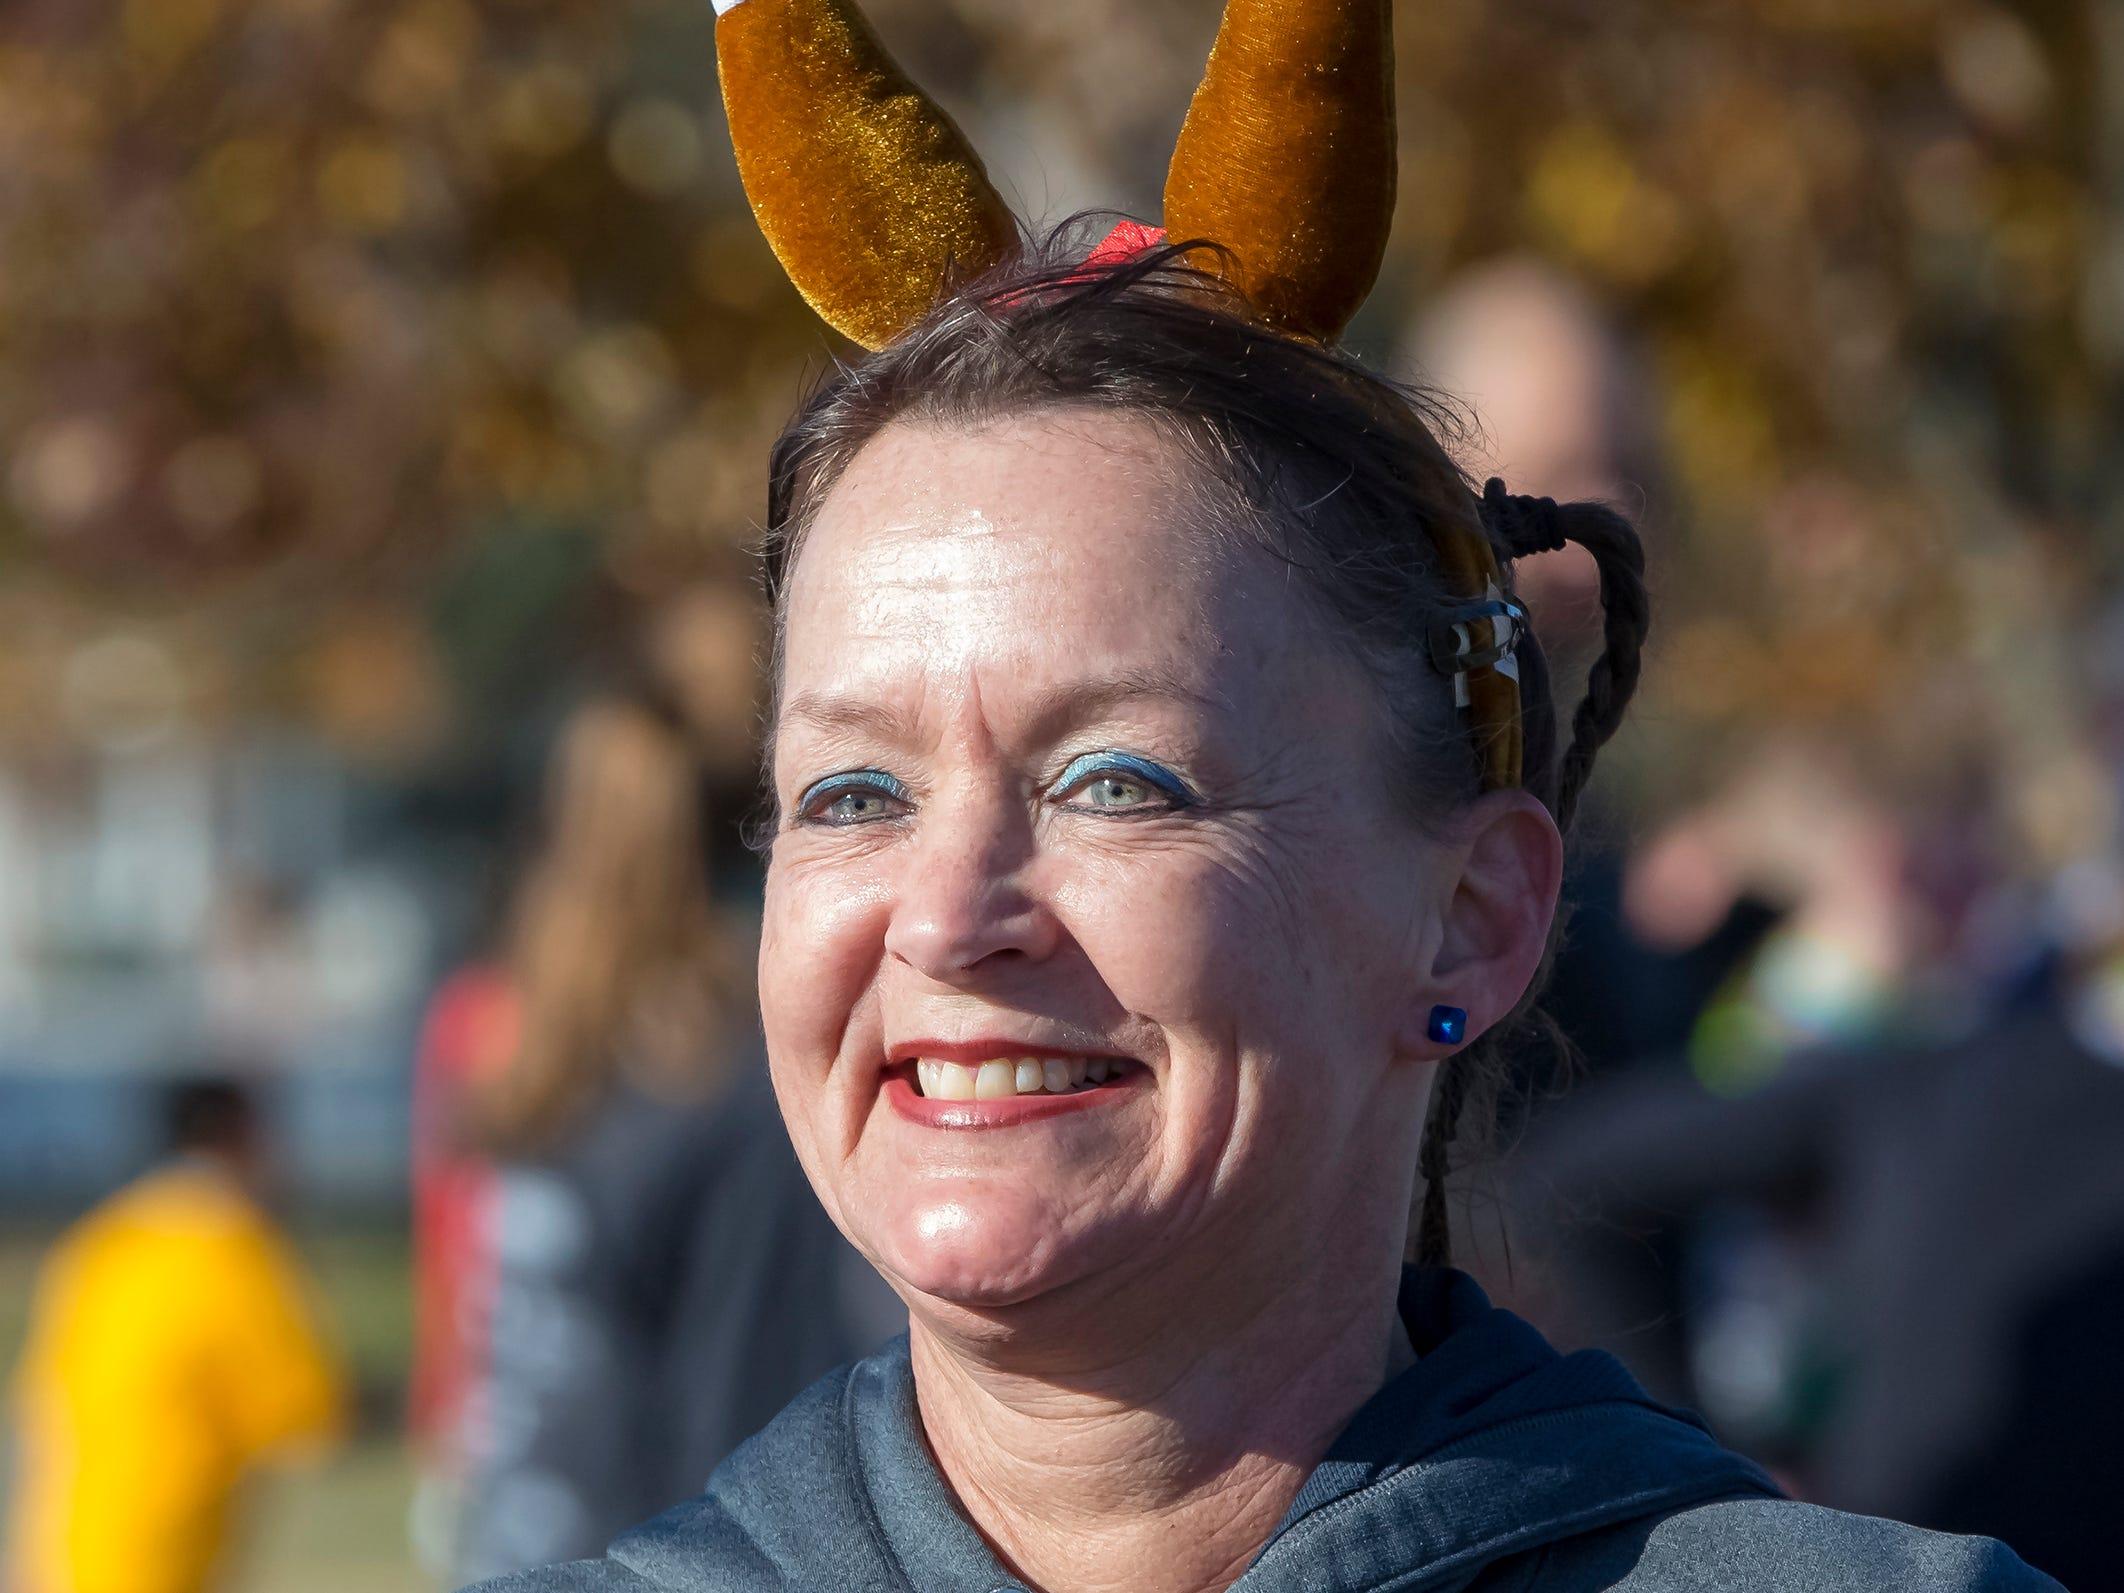 The 2018 Borodash, a 4-mile walk/run through historic Murfreesboro, was  held on Thanksgiving (Nov. 22).